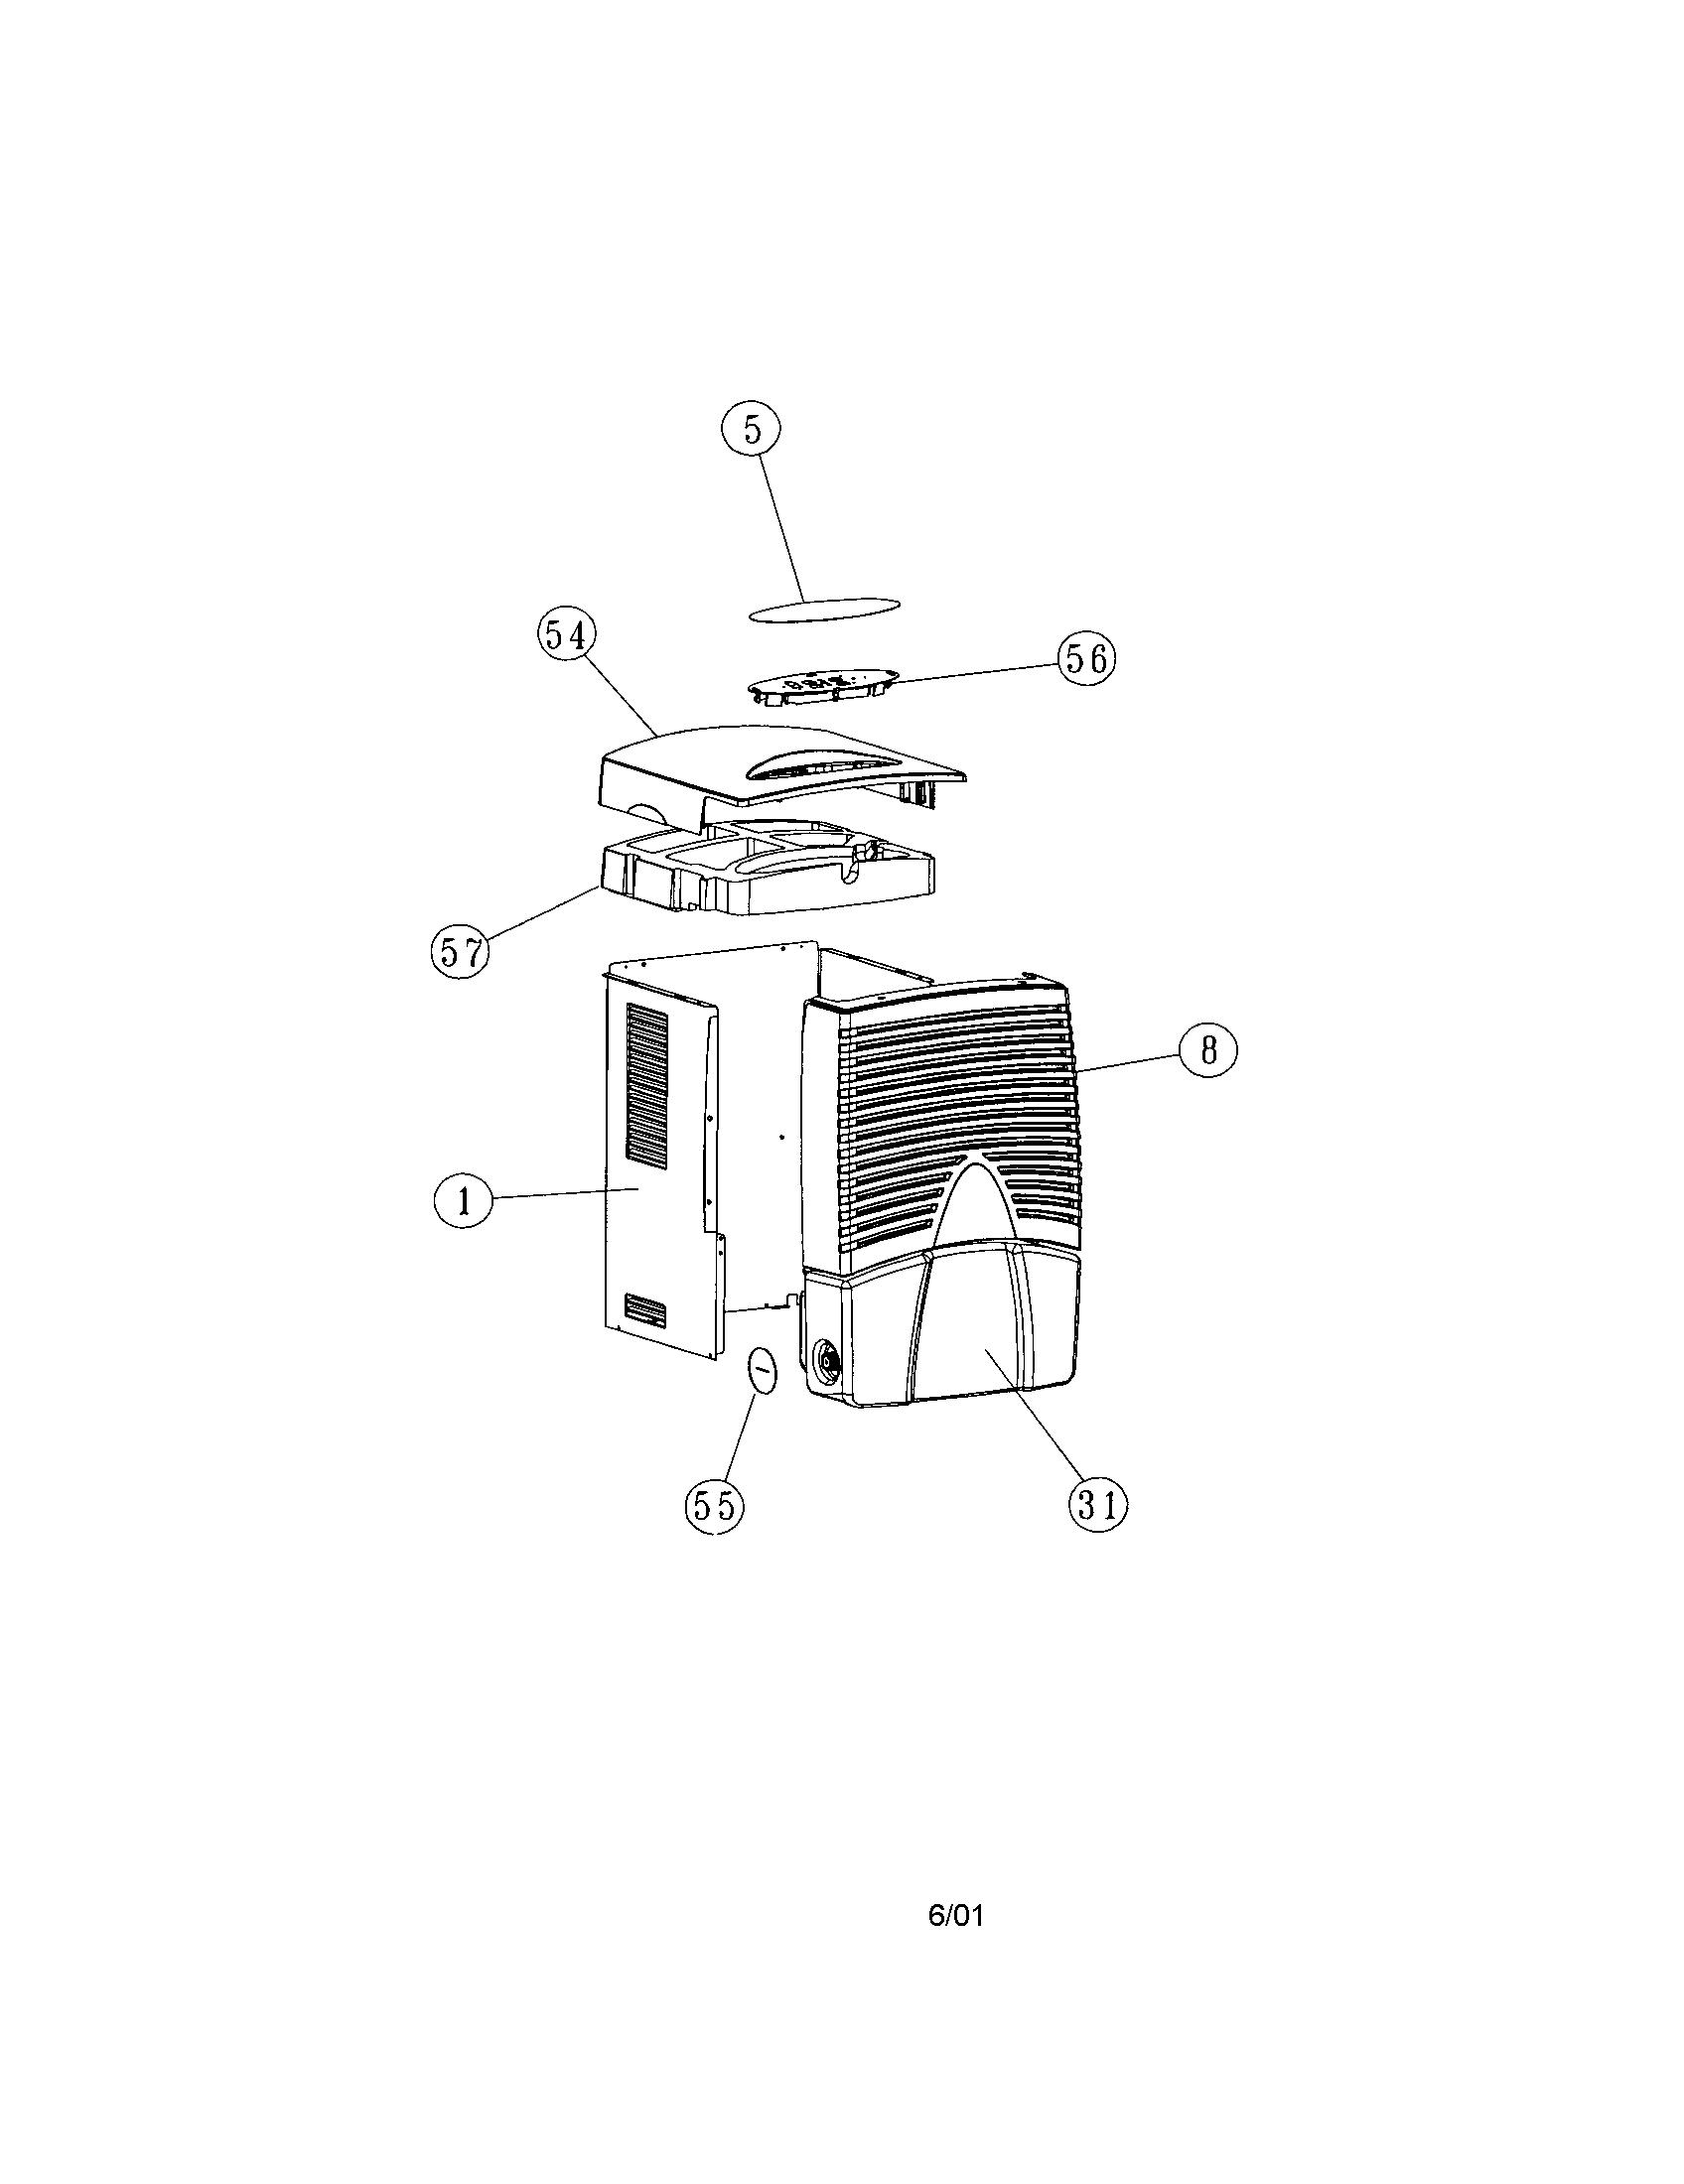 [DIAGRAM] Hisense Dehumidifier Parts Diagram FULL Version